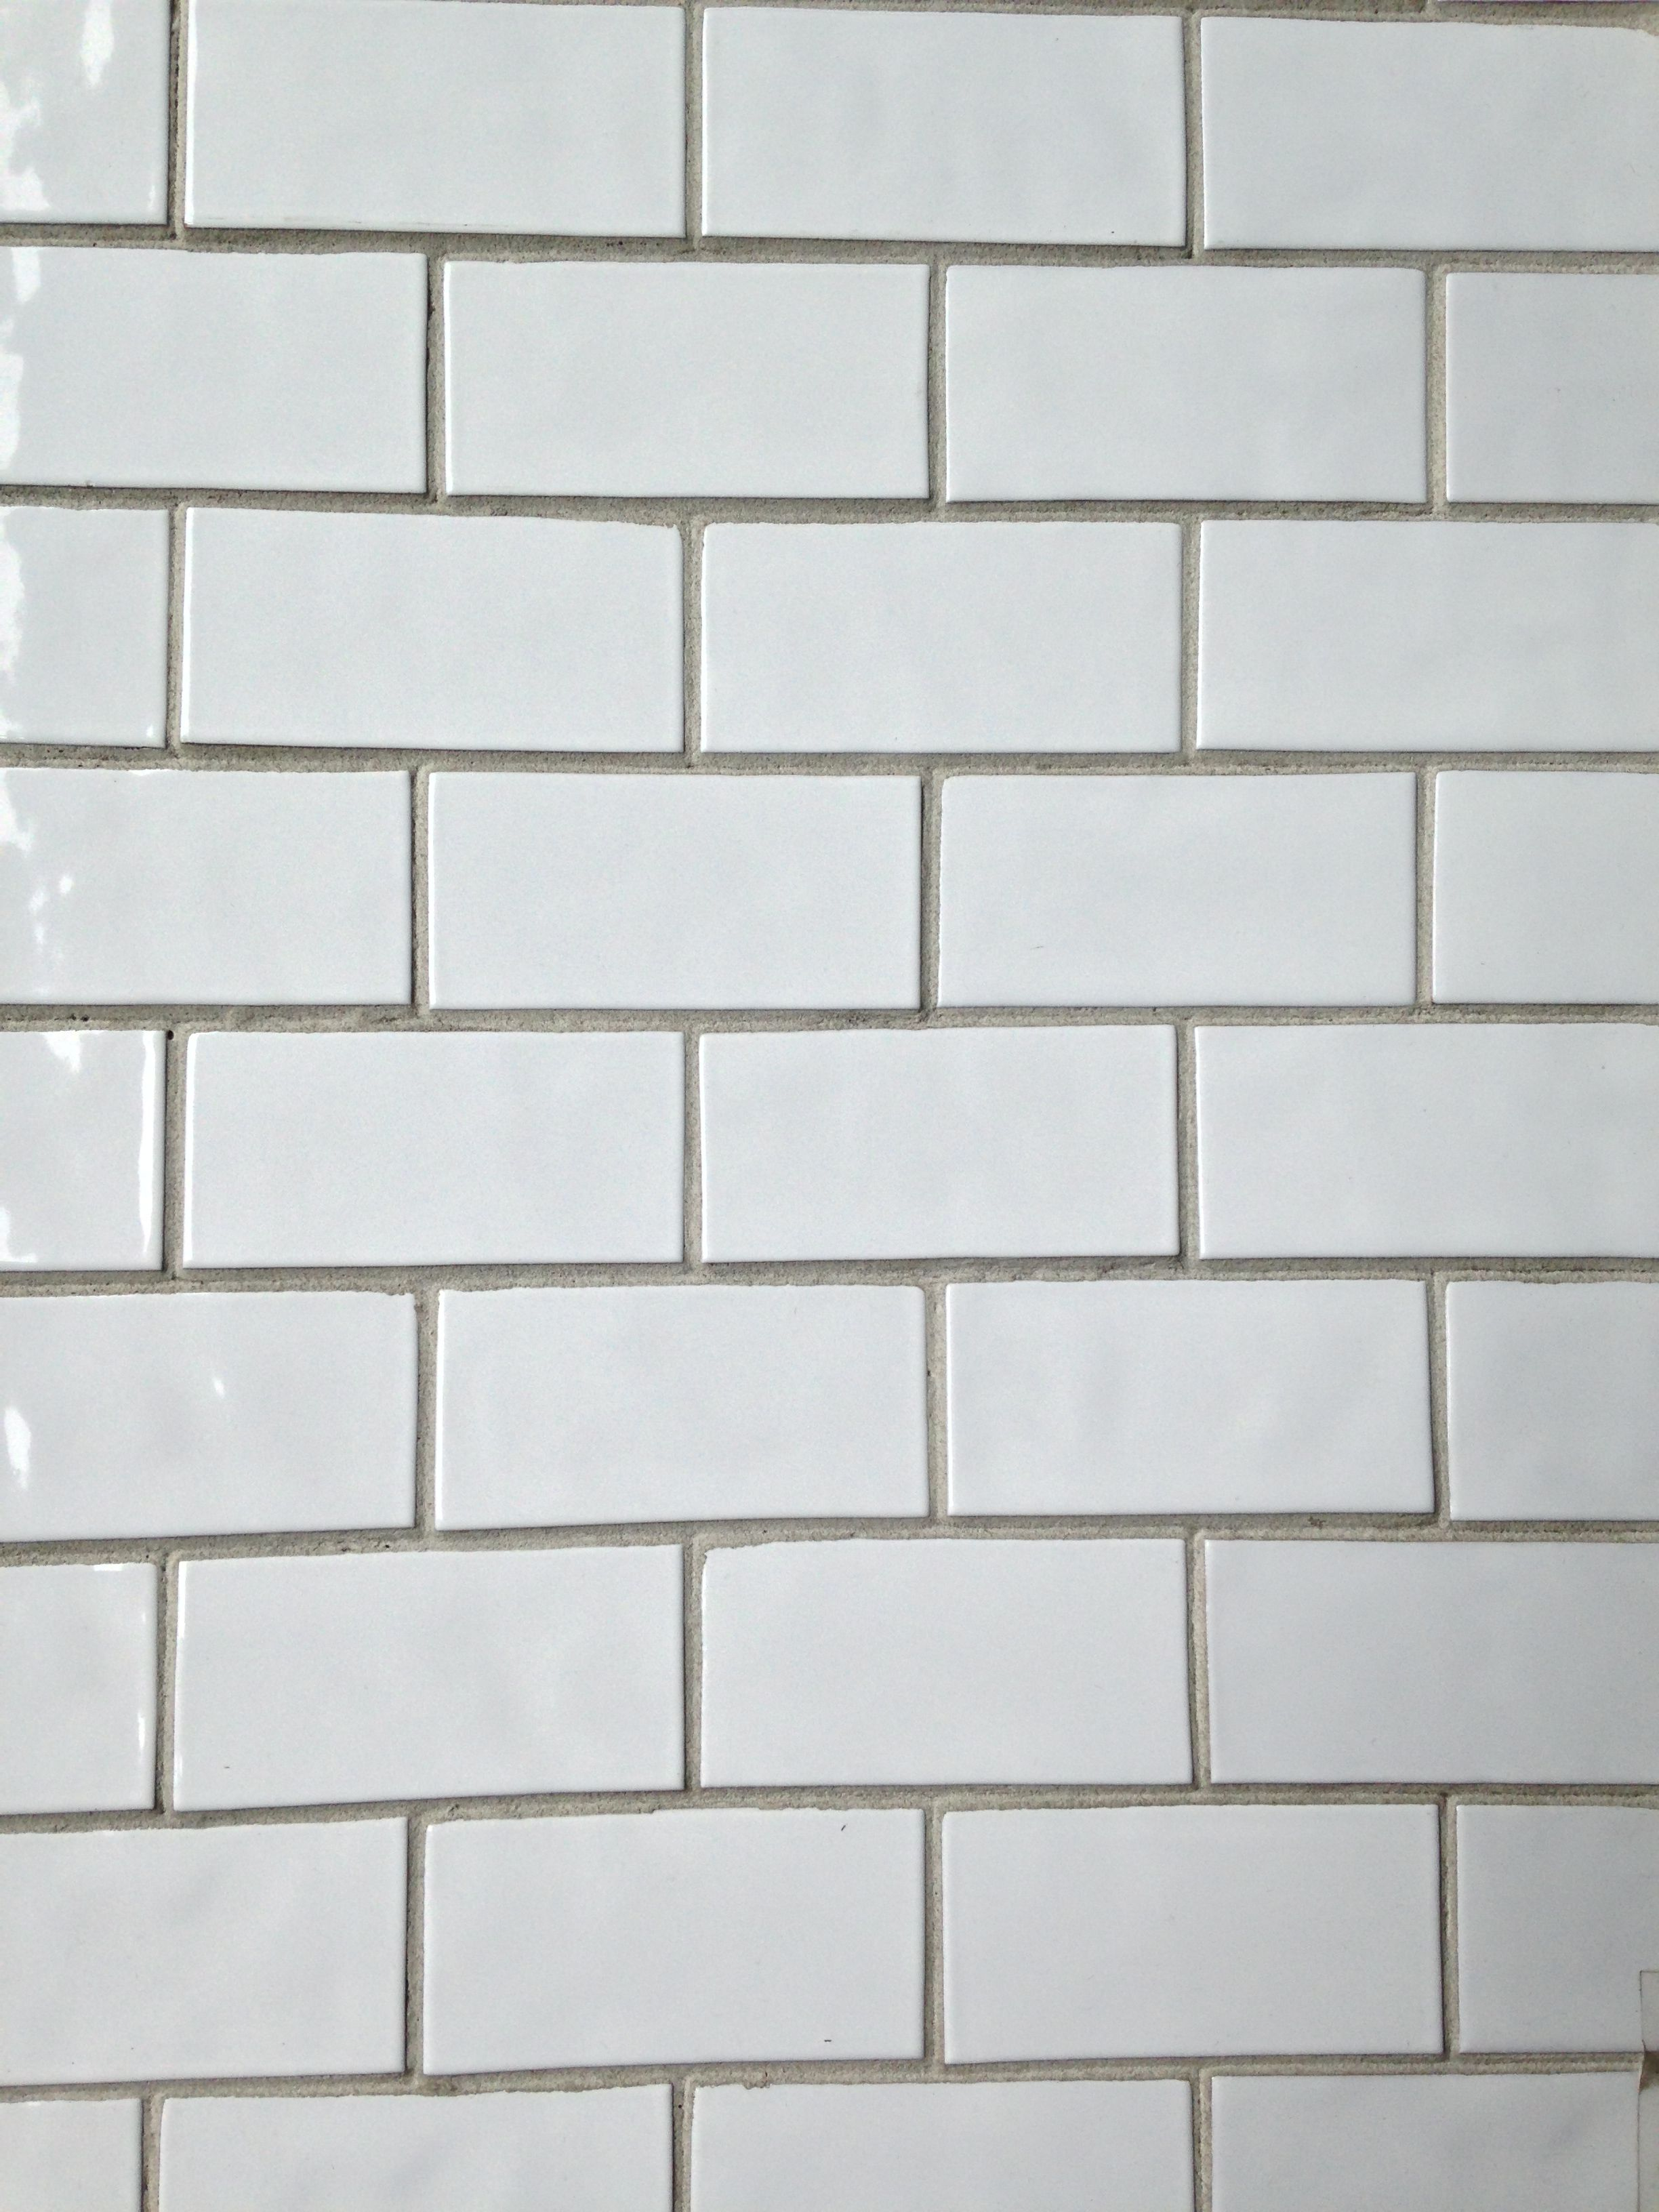 World Mosaic Tile | Ceramica Antigua | Tiles Vancouver, Mosaic Tiles